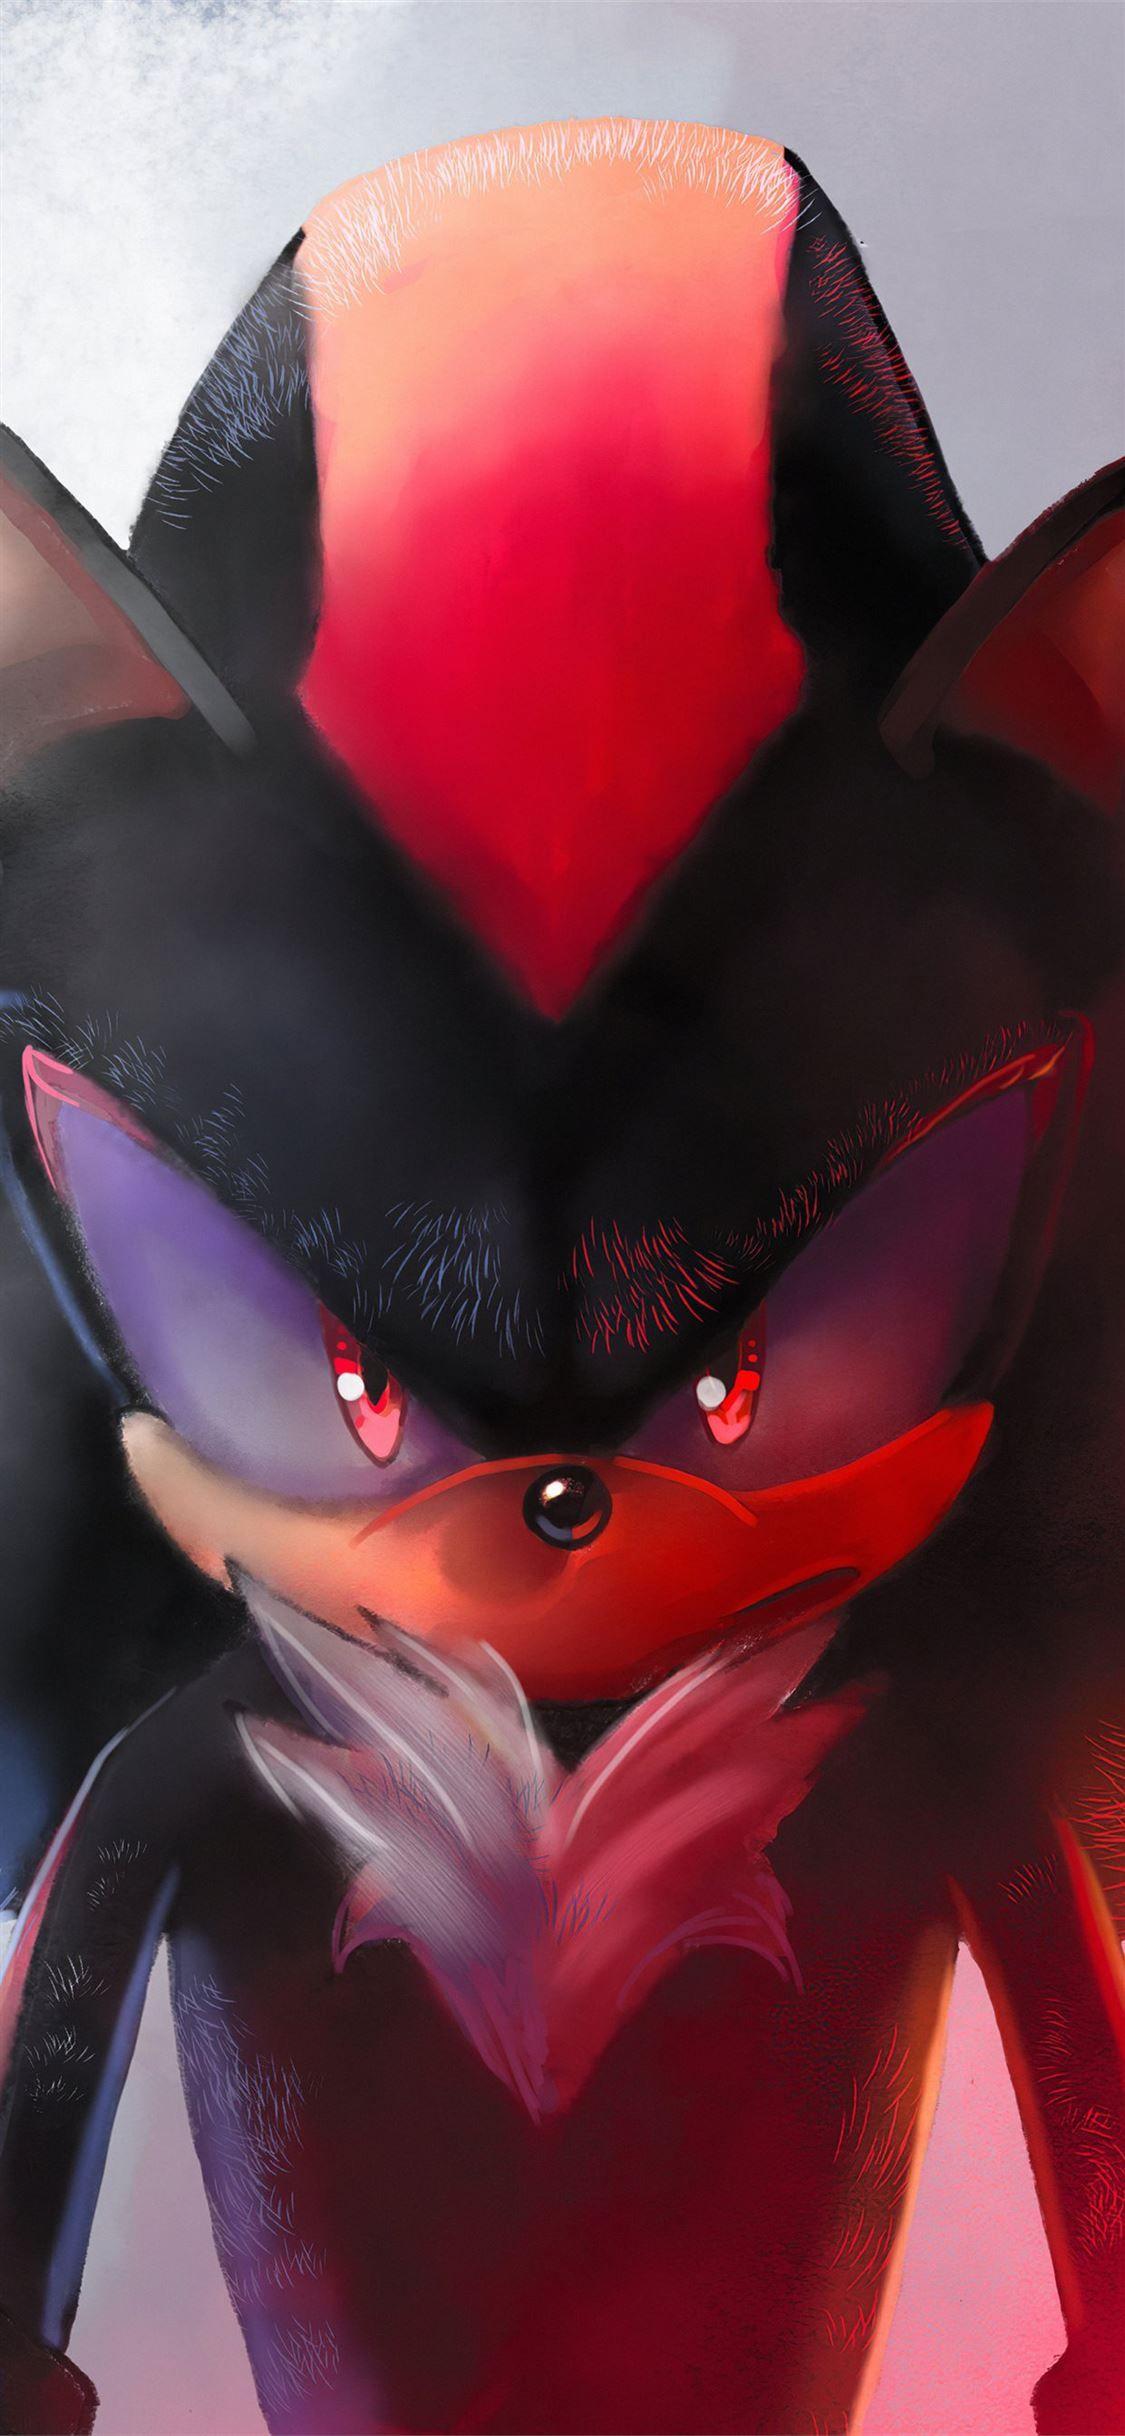 evil sonic the hedgehog SonicTheHedgehog movies